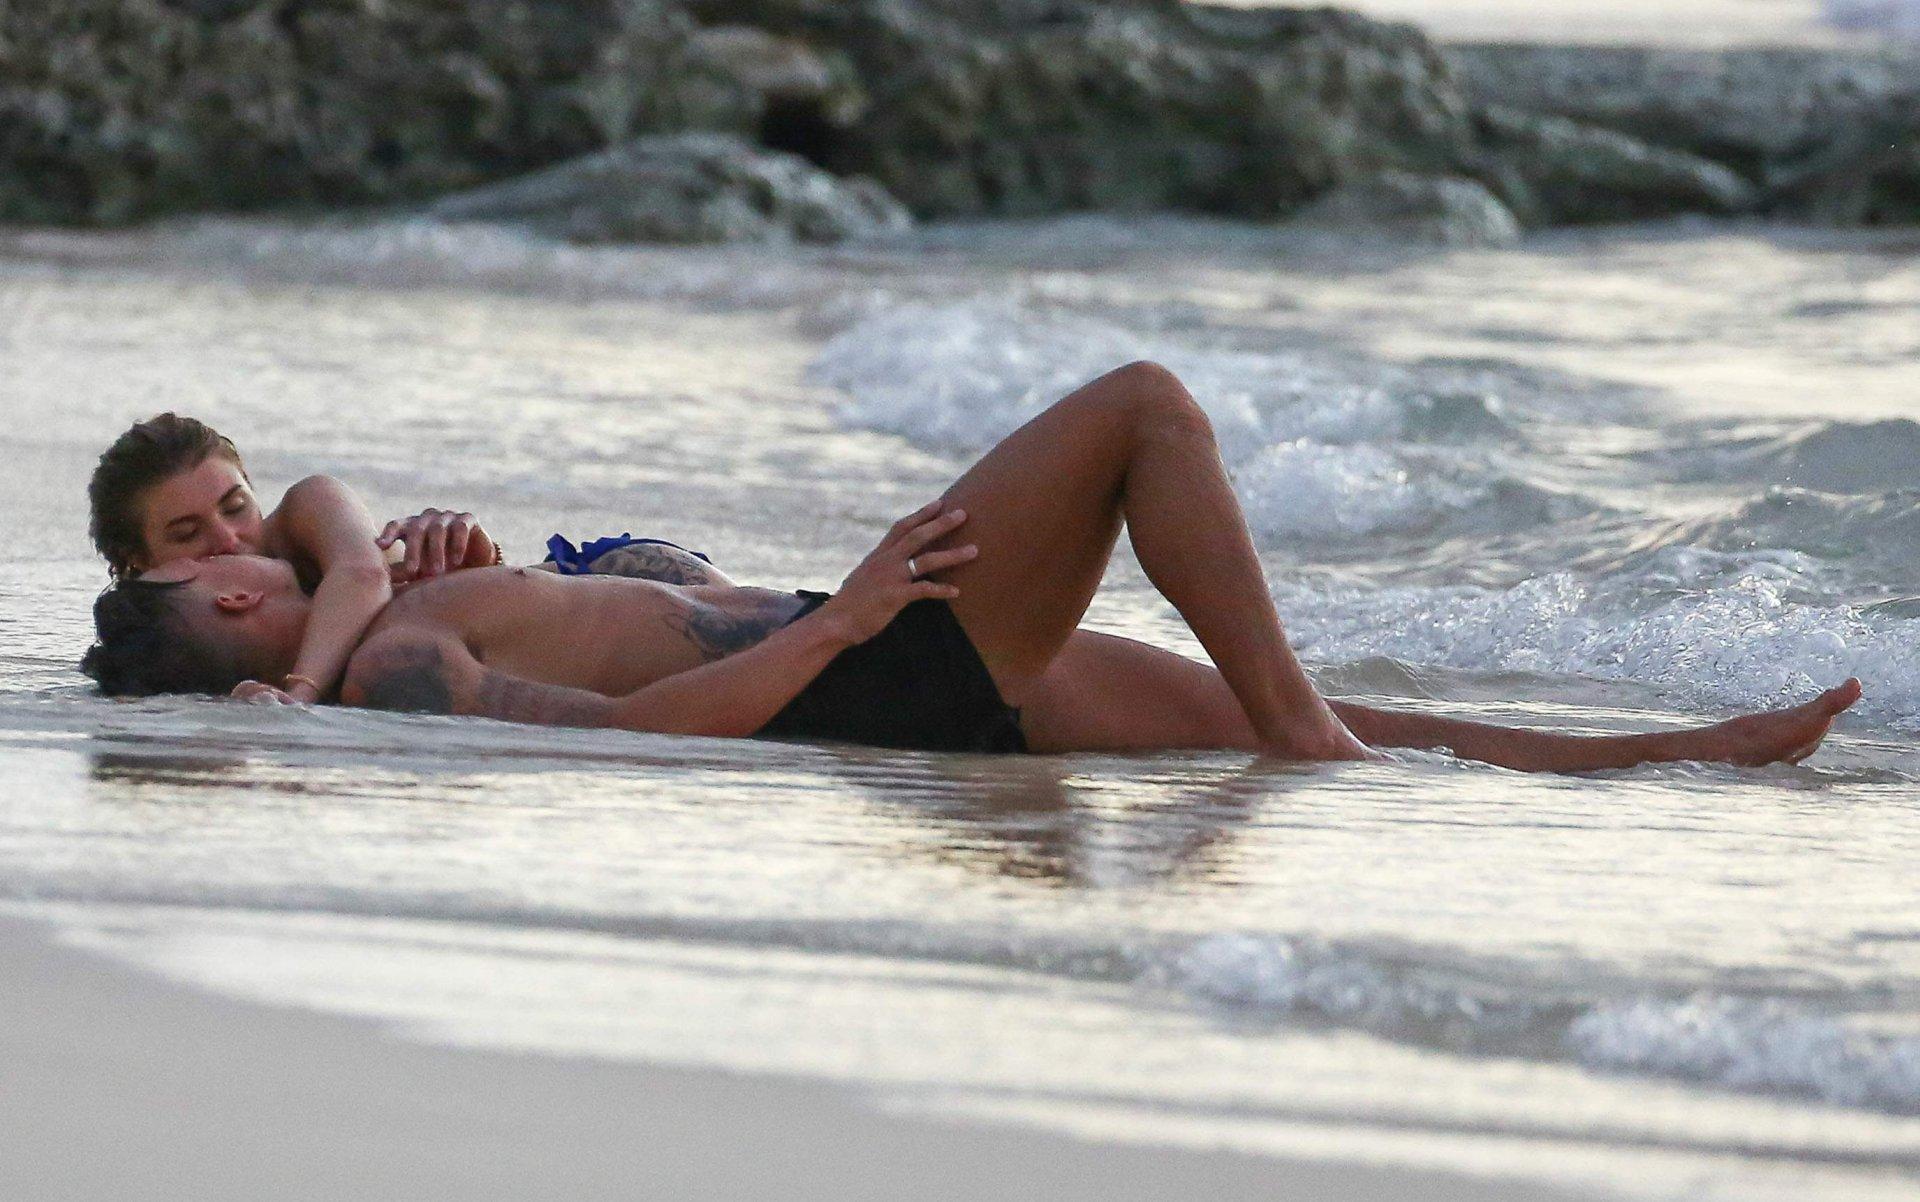 Olivia buckland sexy 29 photos nude (58 photo), Tits Celebrity pics